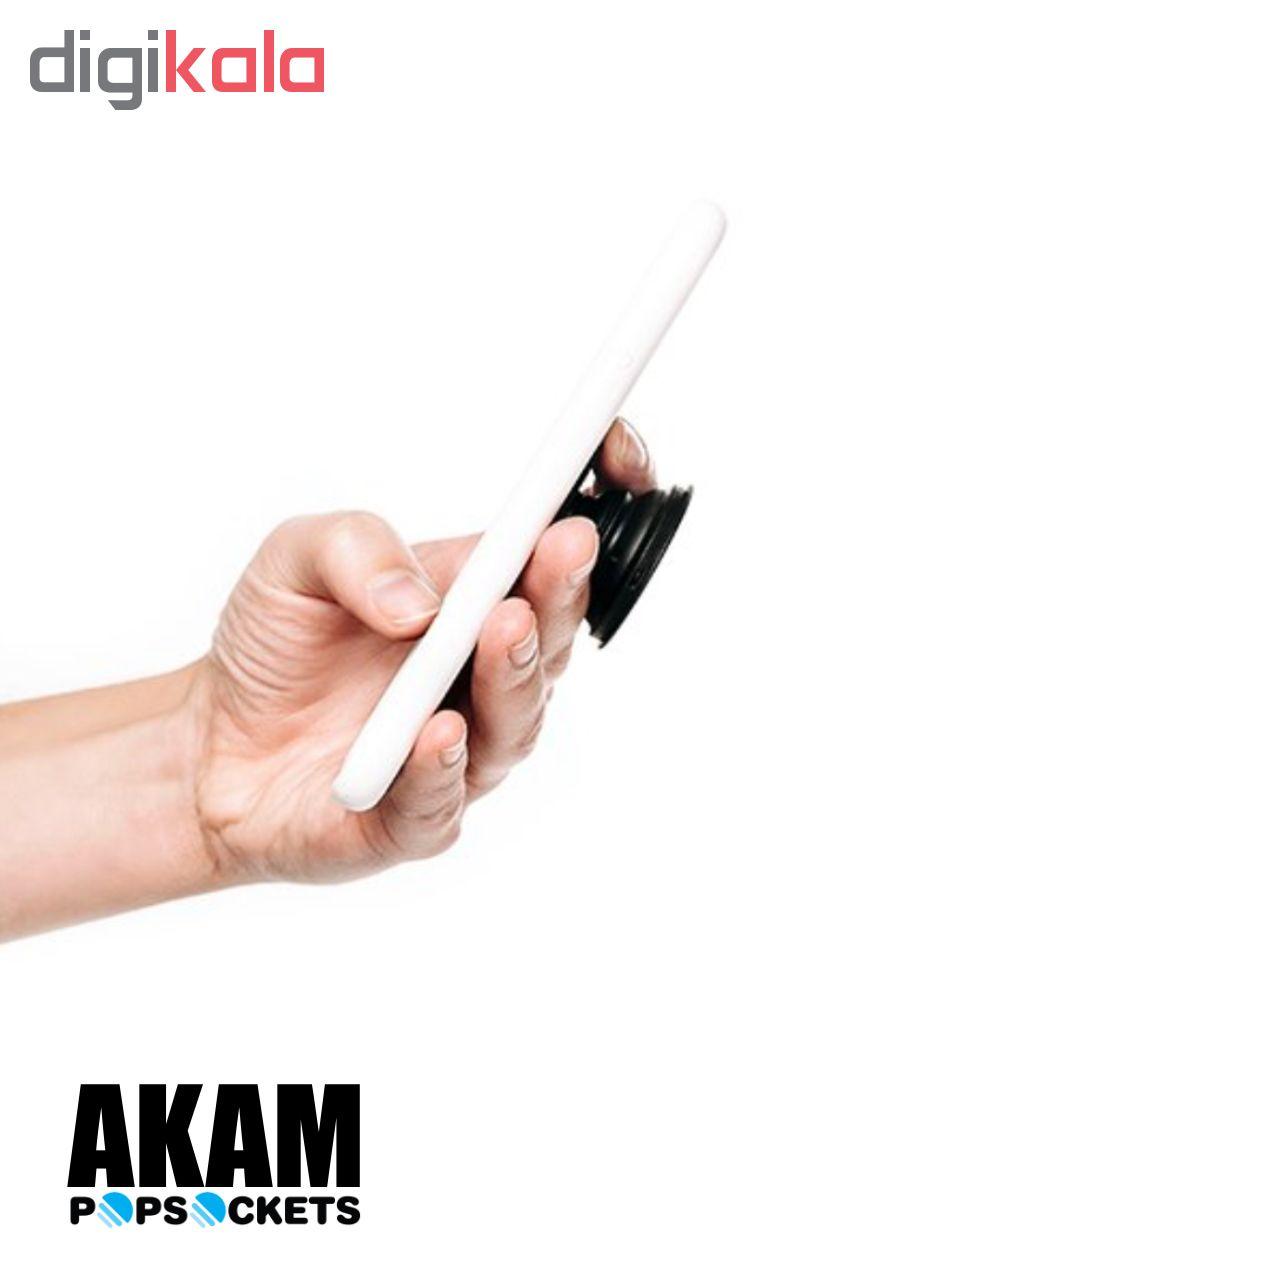 پایه نگهدارنده گوشی موبایل پاپ سوکت آکام مدل APS0079 main 1 8